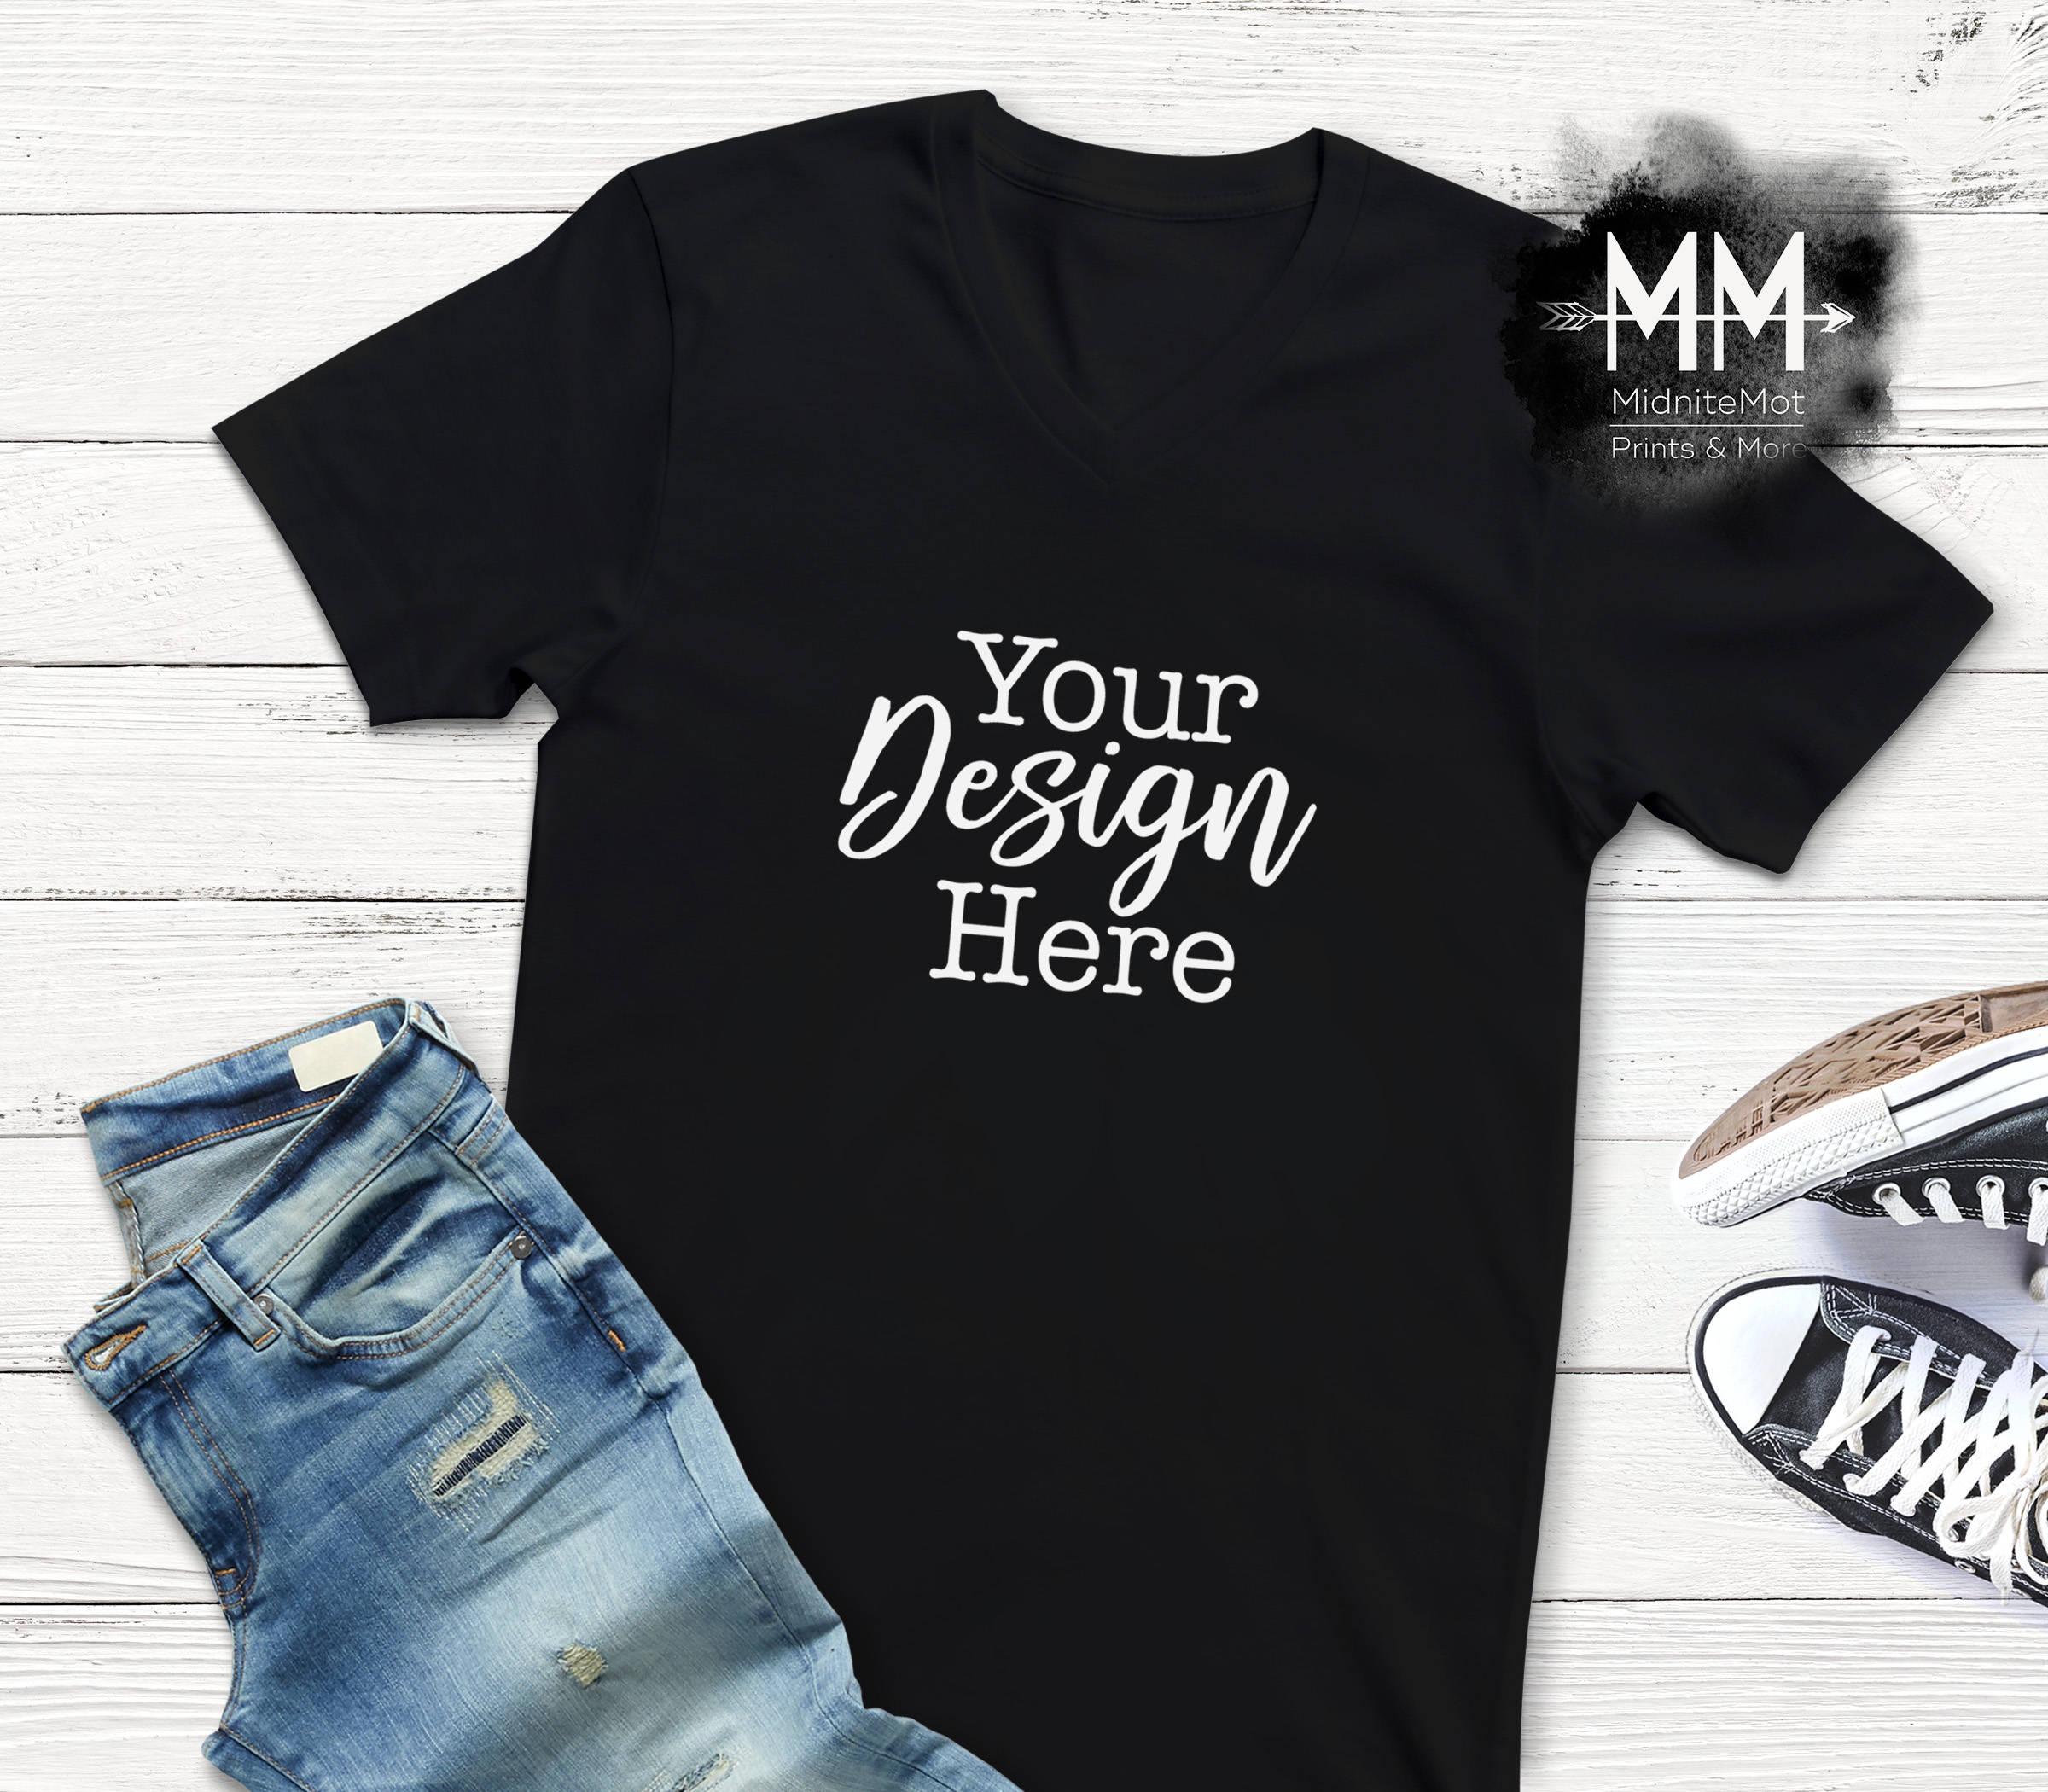 V Neck Black T Shirt Mockup Black Shirt Flat Lay Display